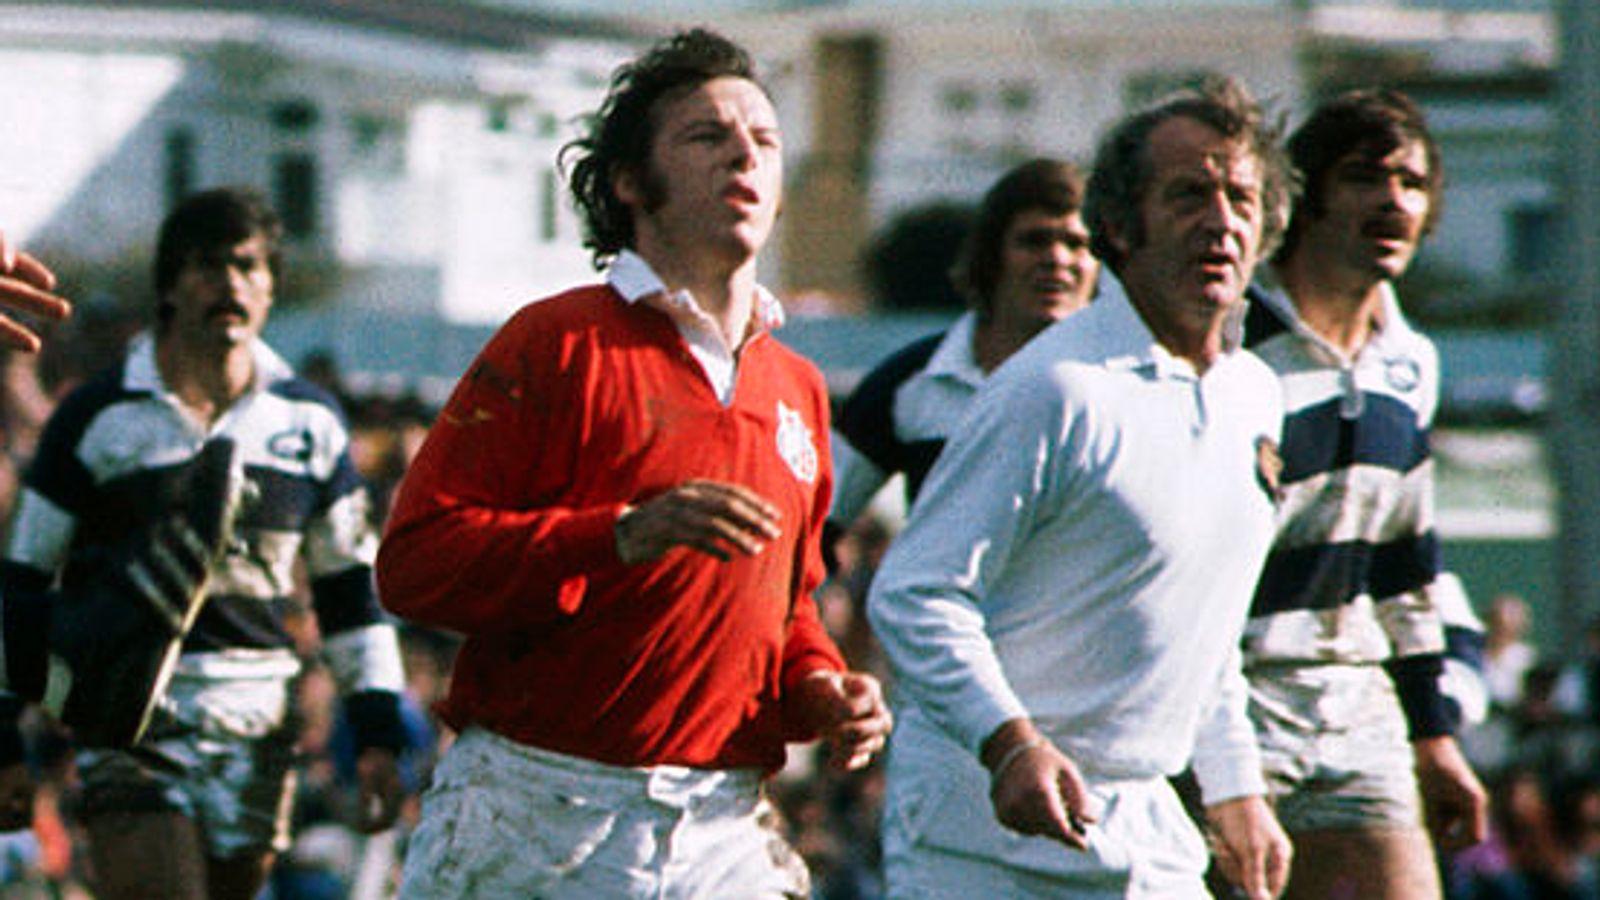 The RIP Sporting Heroes Thread-skynews-jj-williams-rugby-player_5153966-jpg